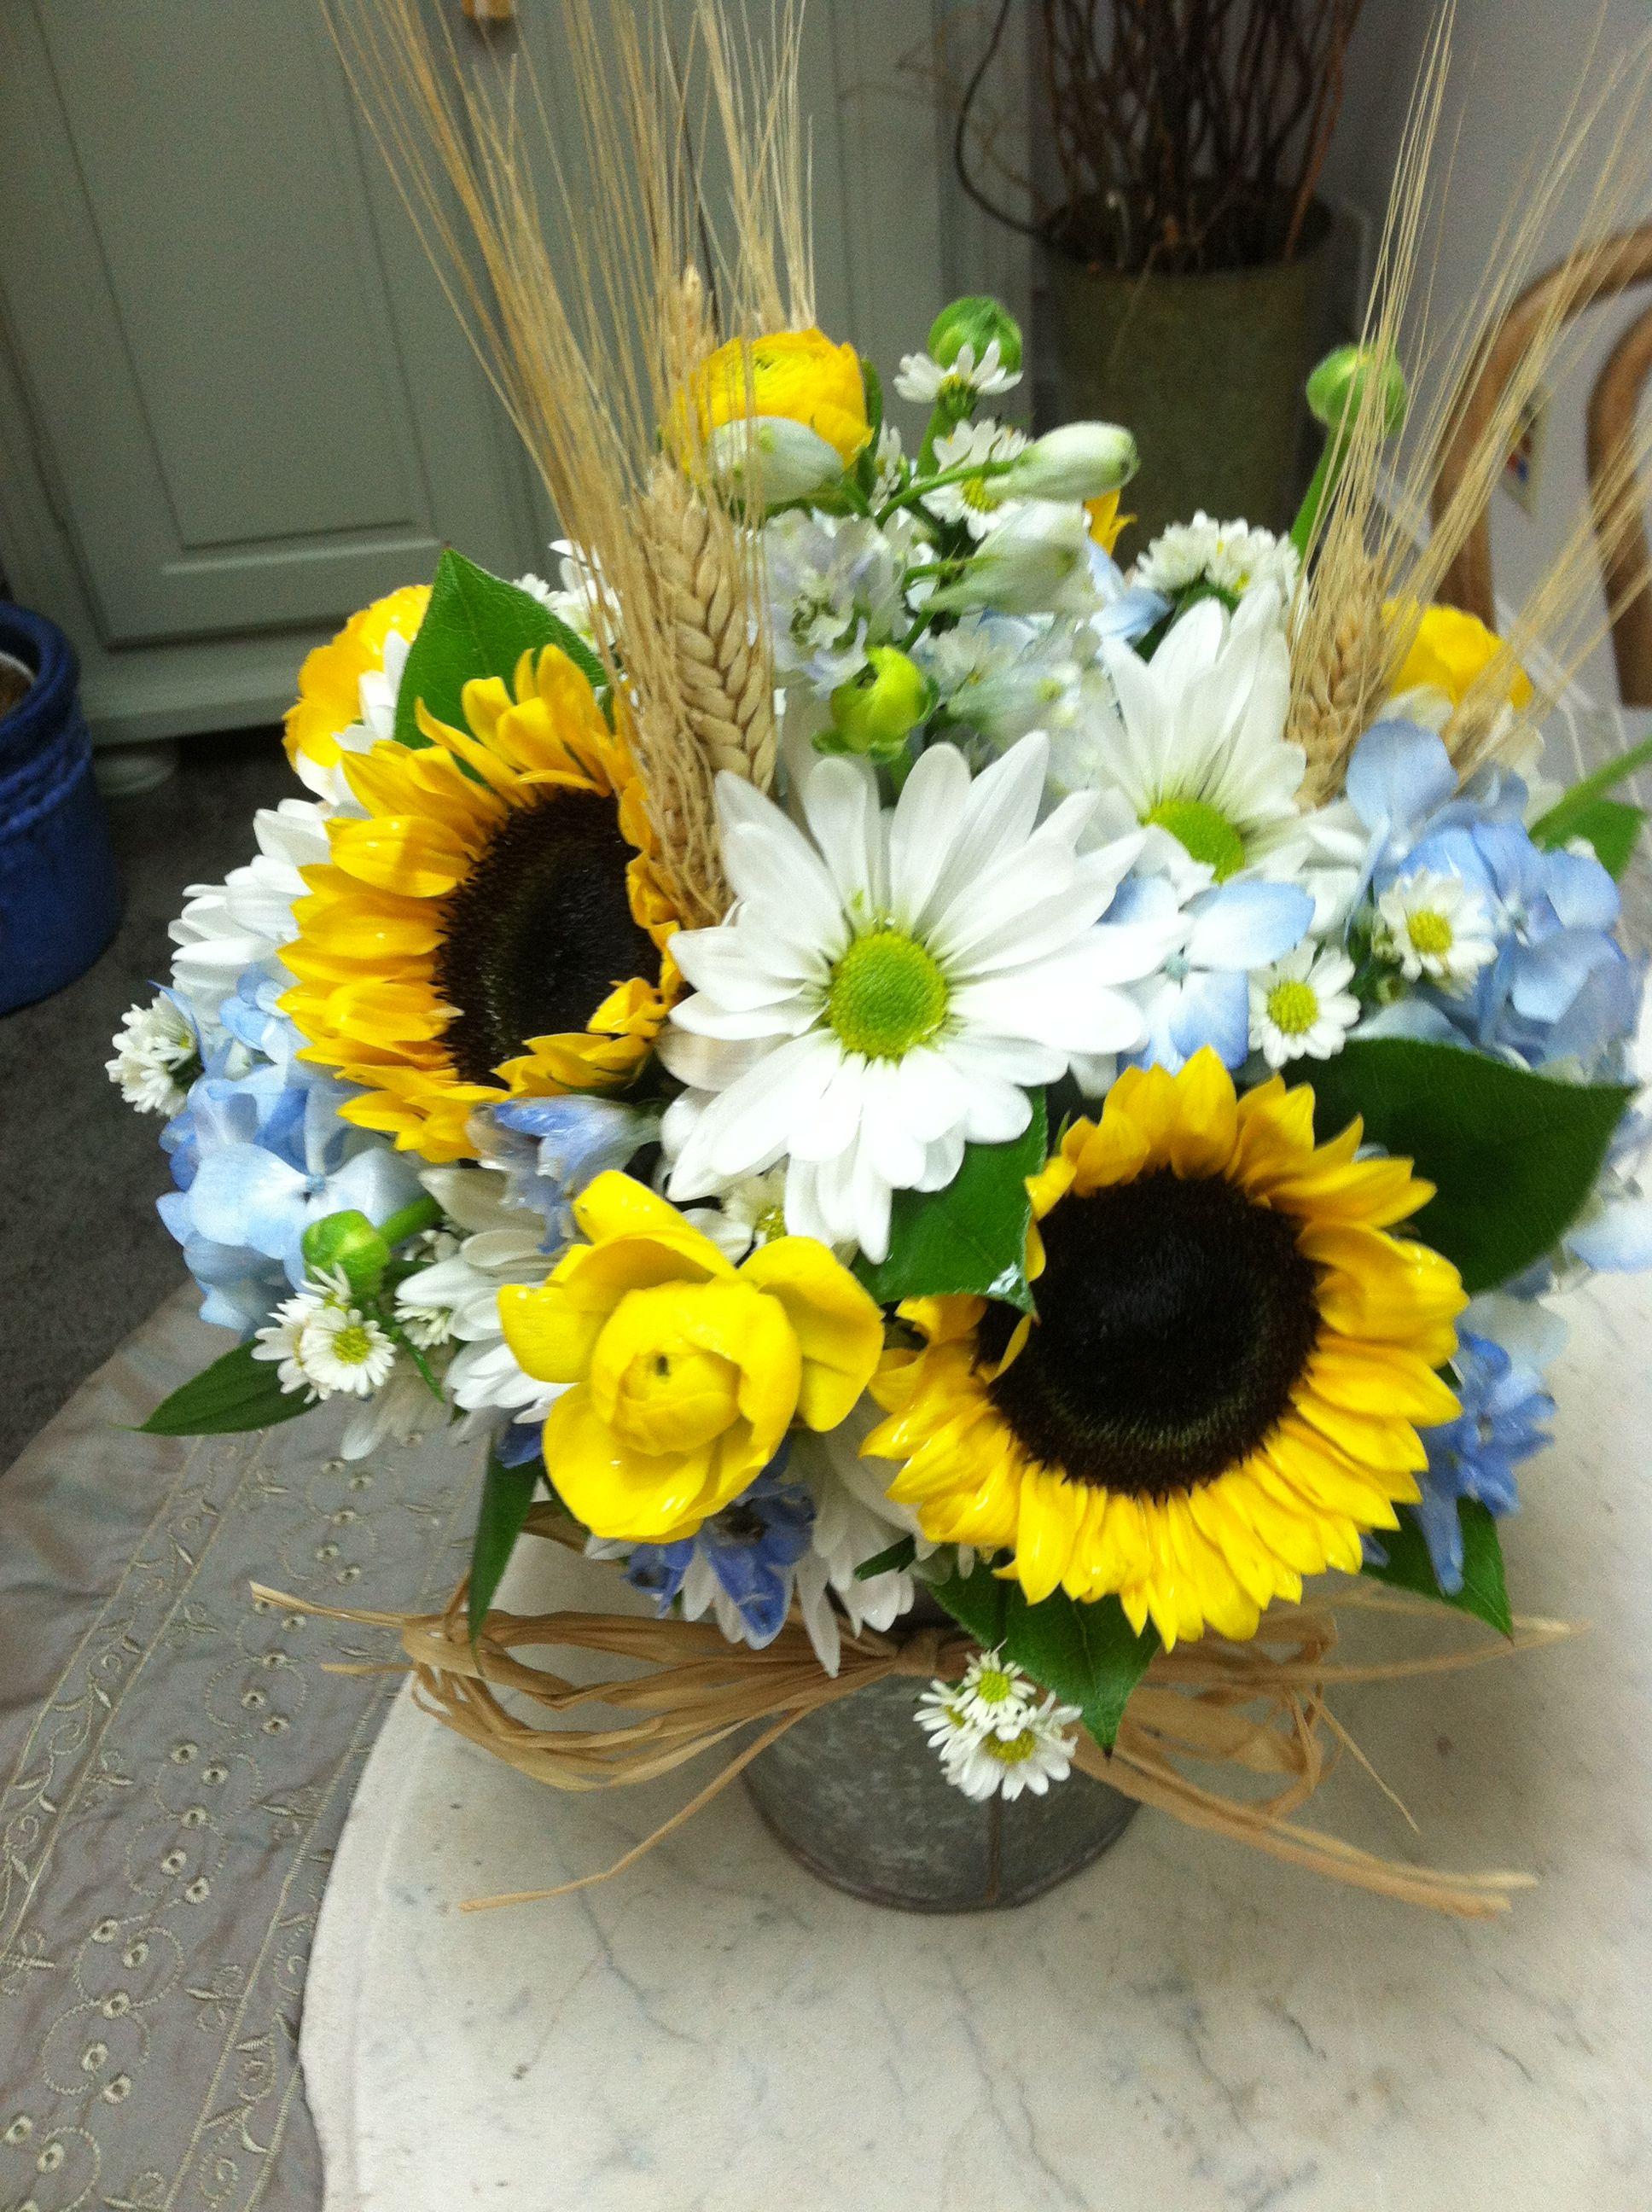 Sunflowers Hydrangea White Daisy Centerpiece Works Of Heart